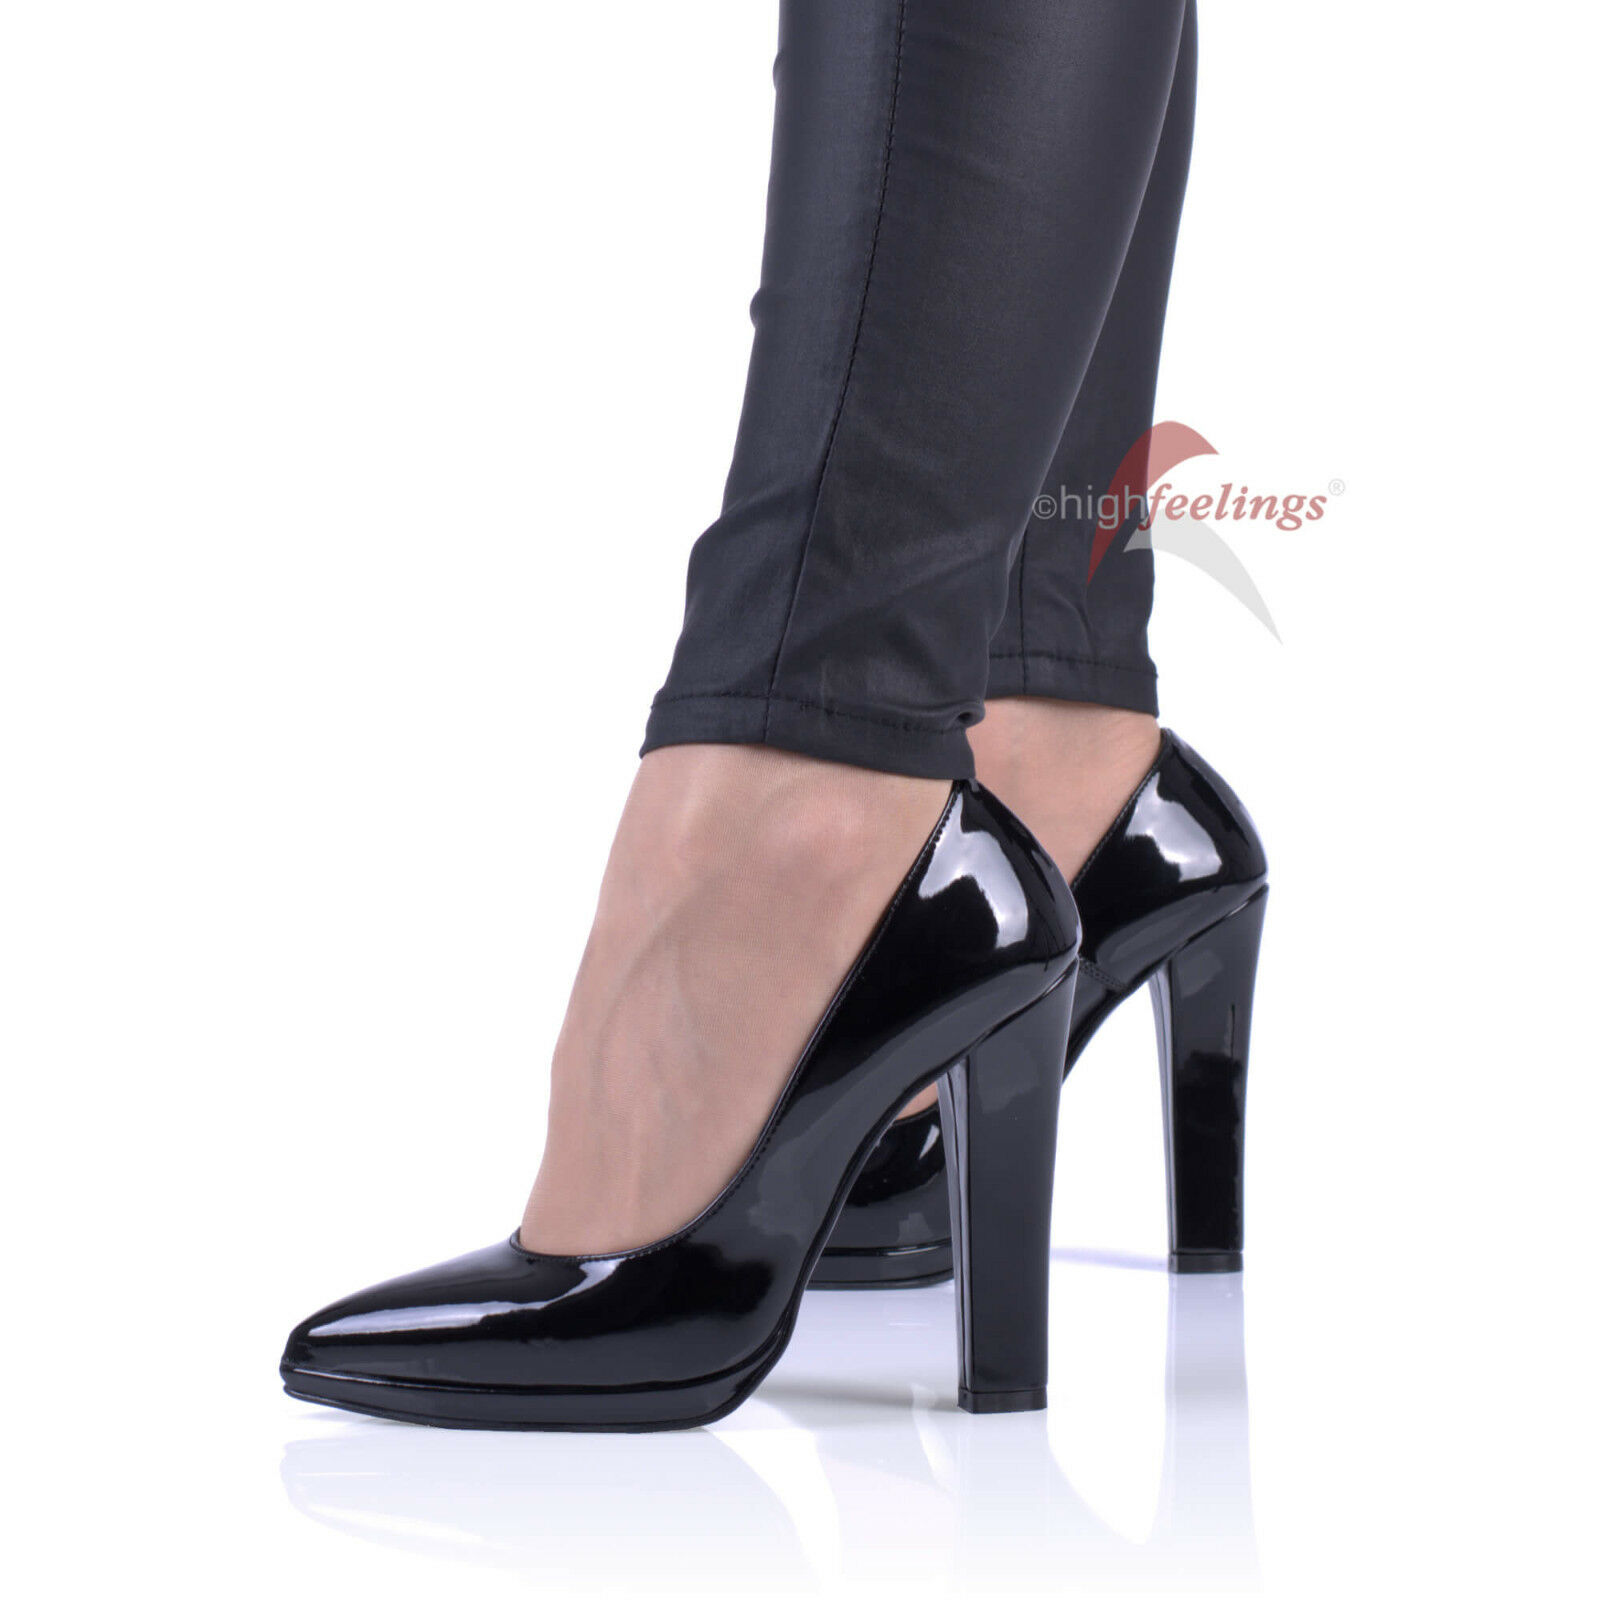 Schwarze Lack Pumps High Heels 11,5 - 13,5 EUR cm Absatz Lackeder Größe EUR 13,5 36 - 47 86930e